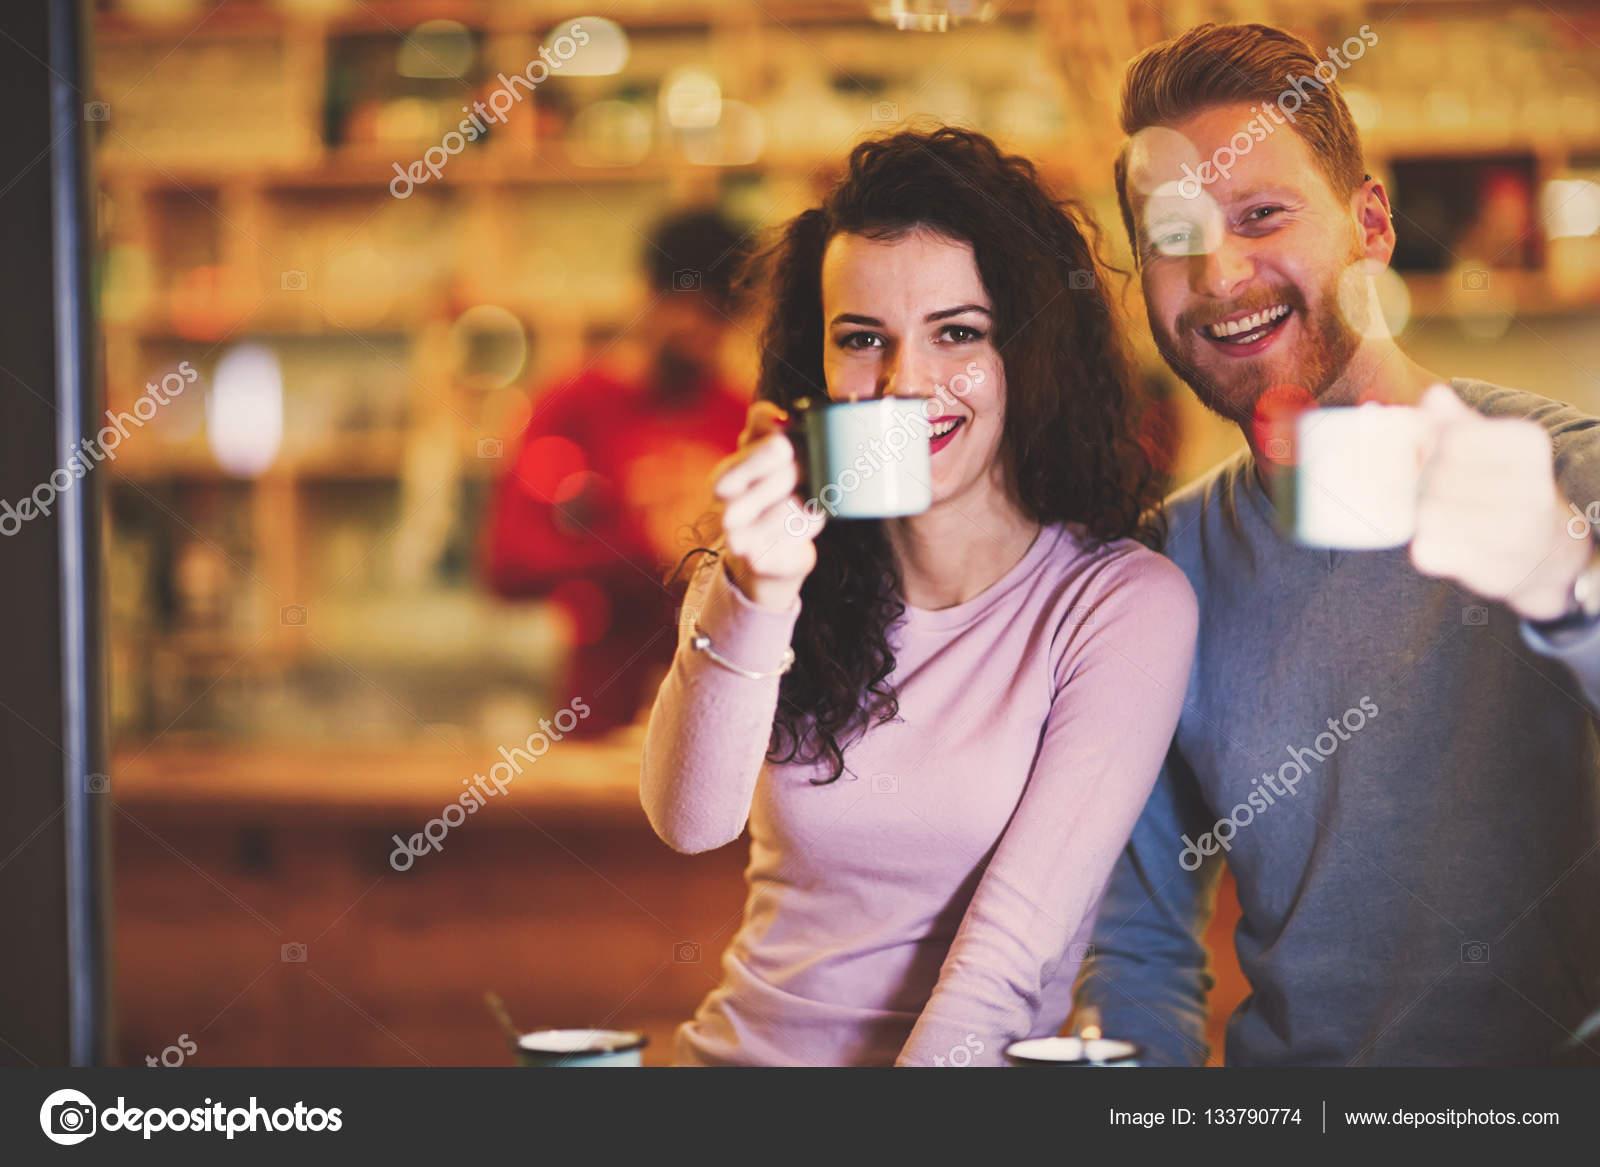 dating με το εστιατόριο του συναδέλφου σου δωρεάν περιοχές γνωριμιών για κινητά με Νότια Αφρική